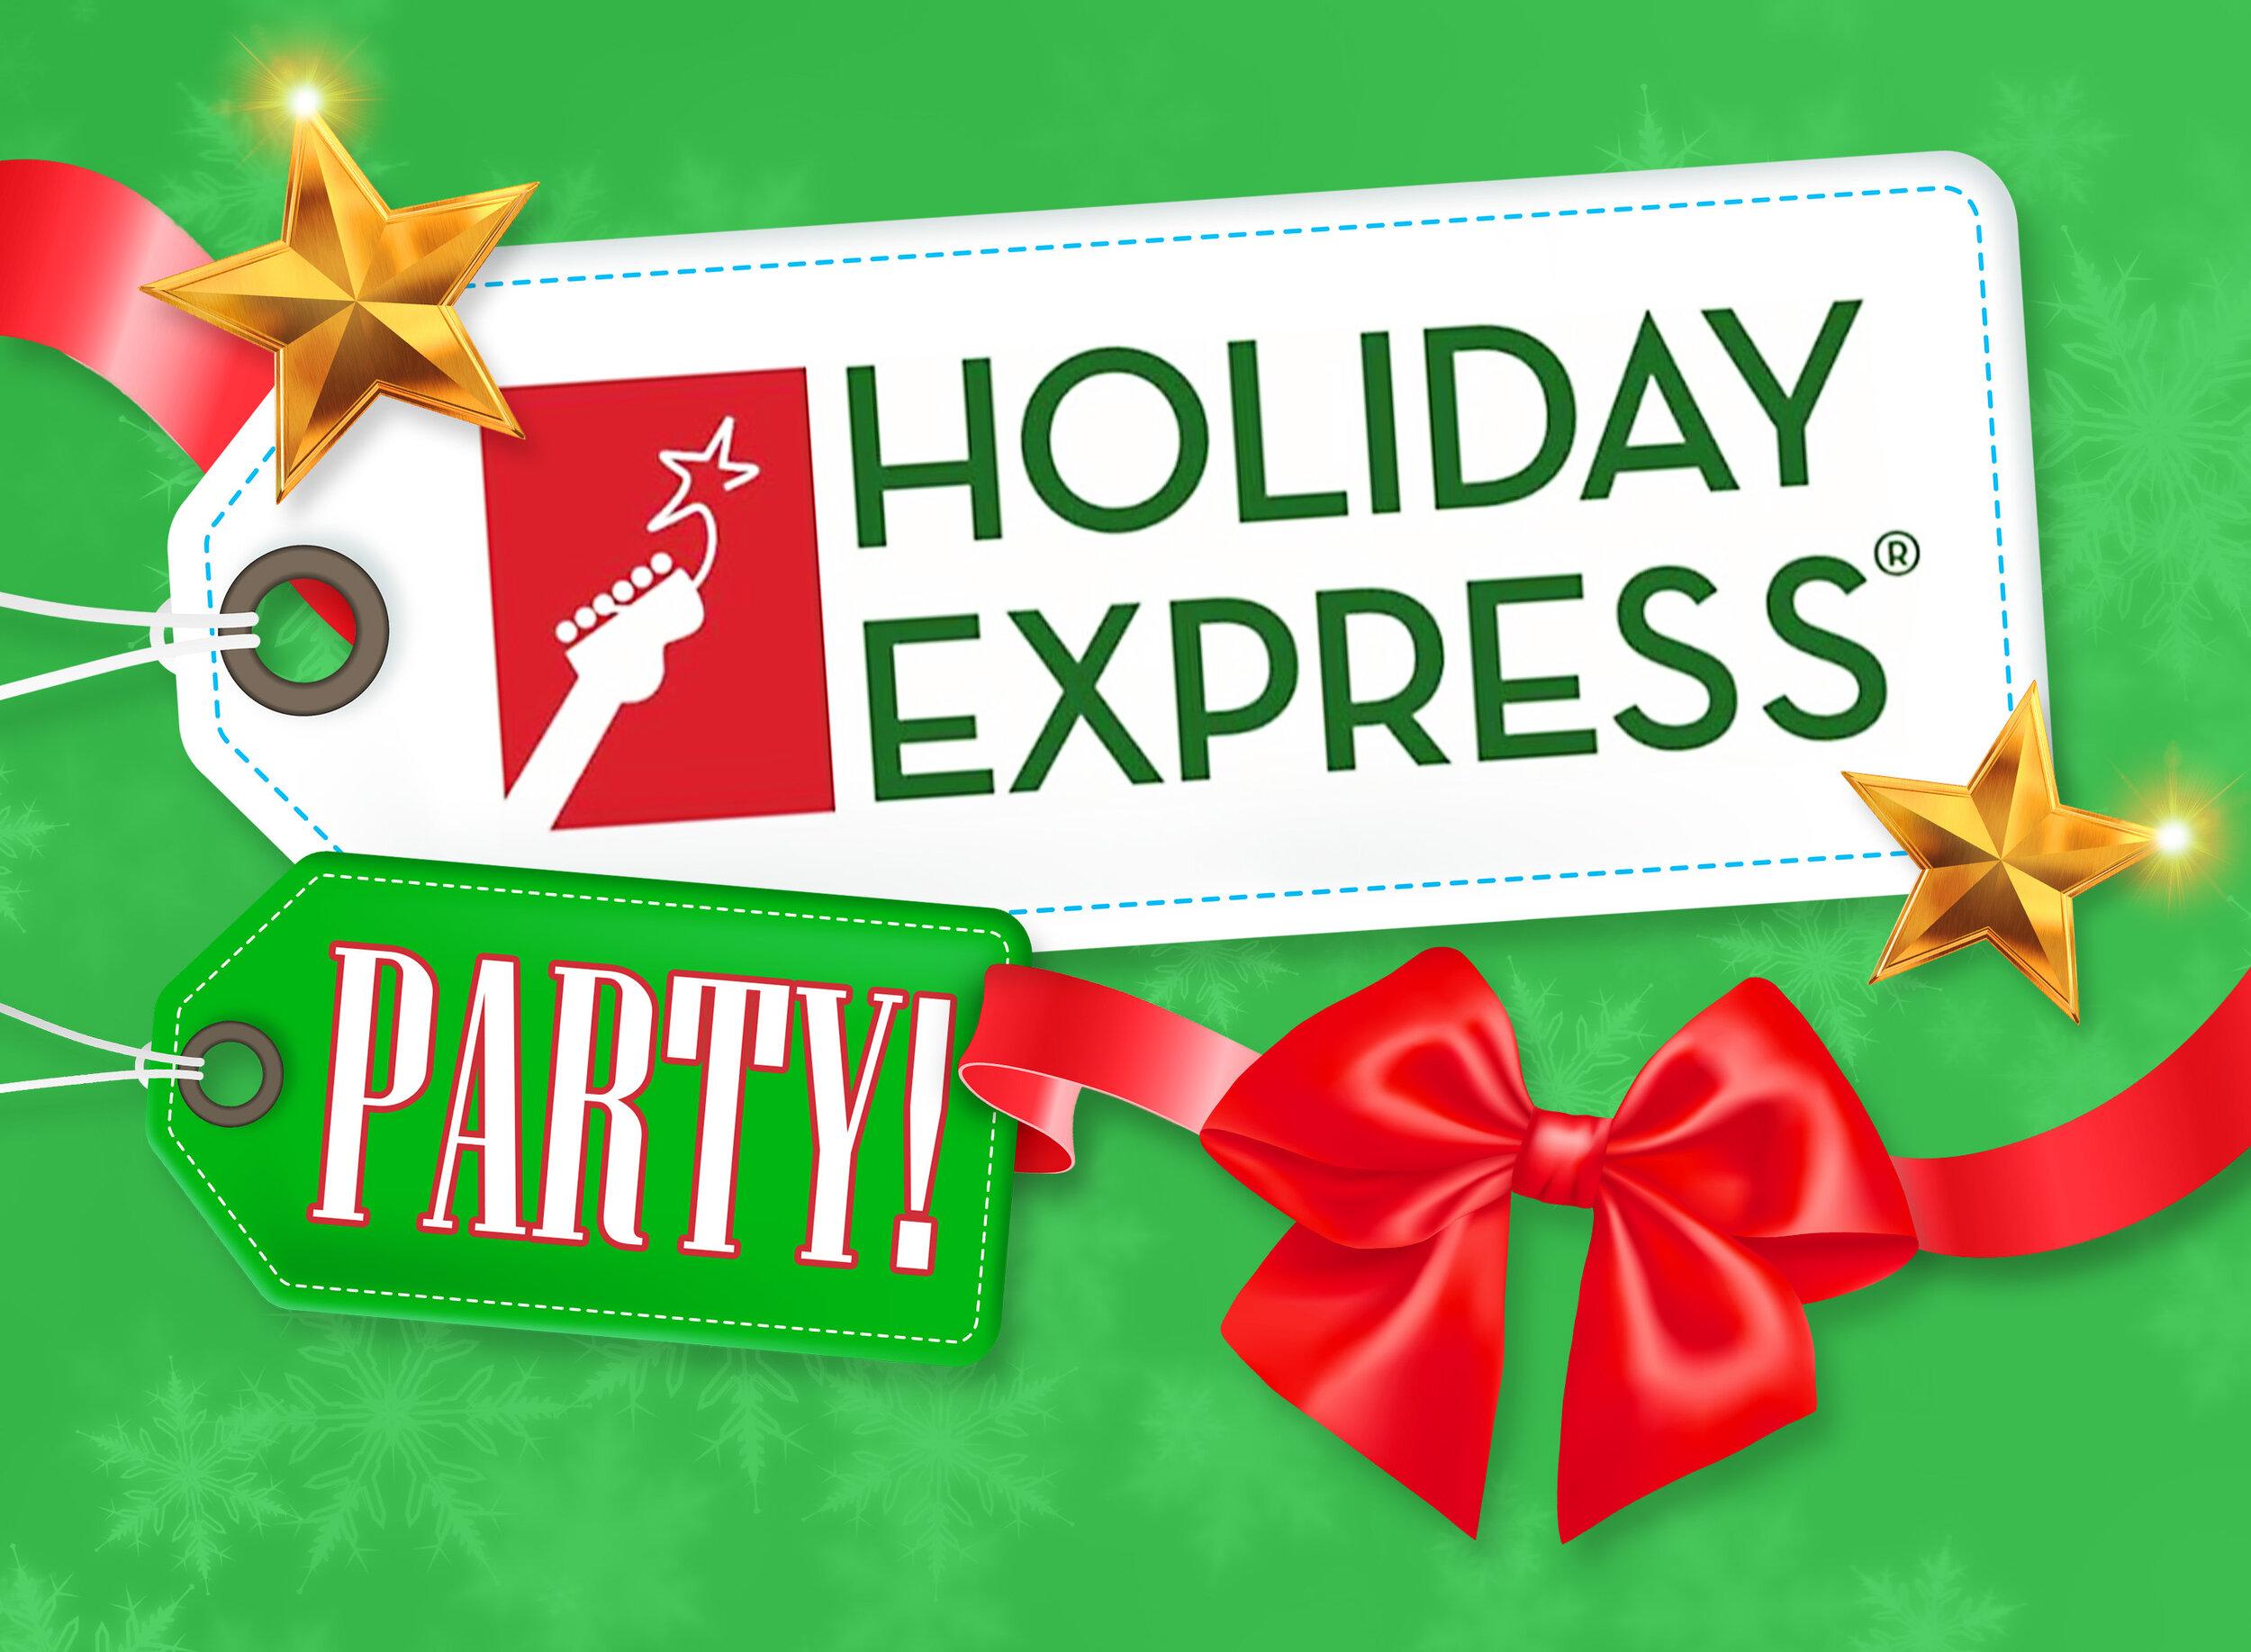 Holiday Express Party.jpg